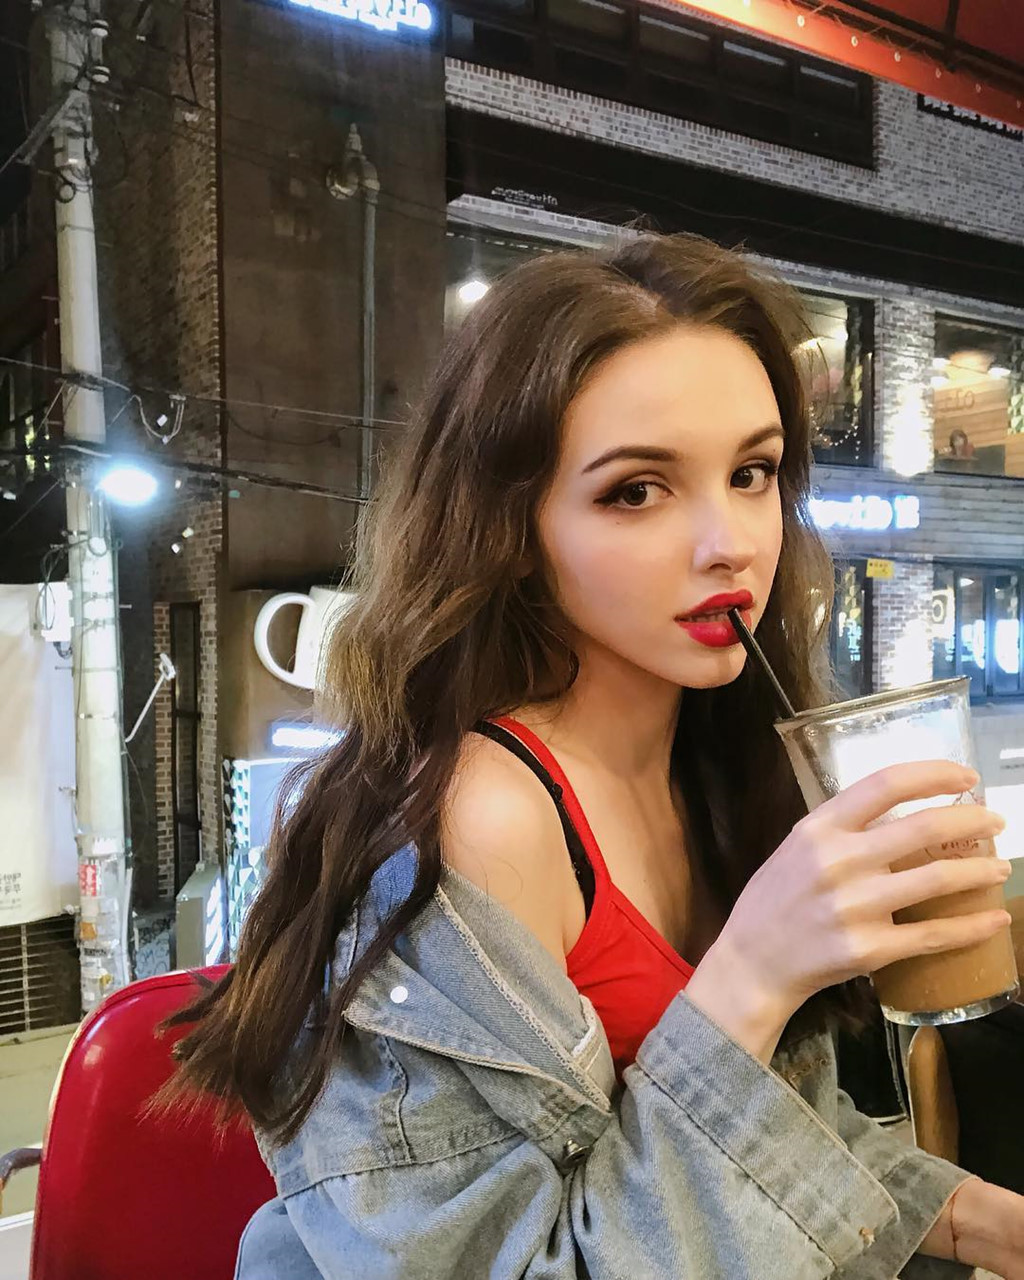 hot-girl-Karimova-Elina-dao-tung-chao-gioi-tre-vi-qua-xinh-dep (3)